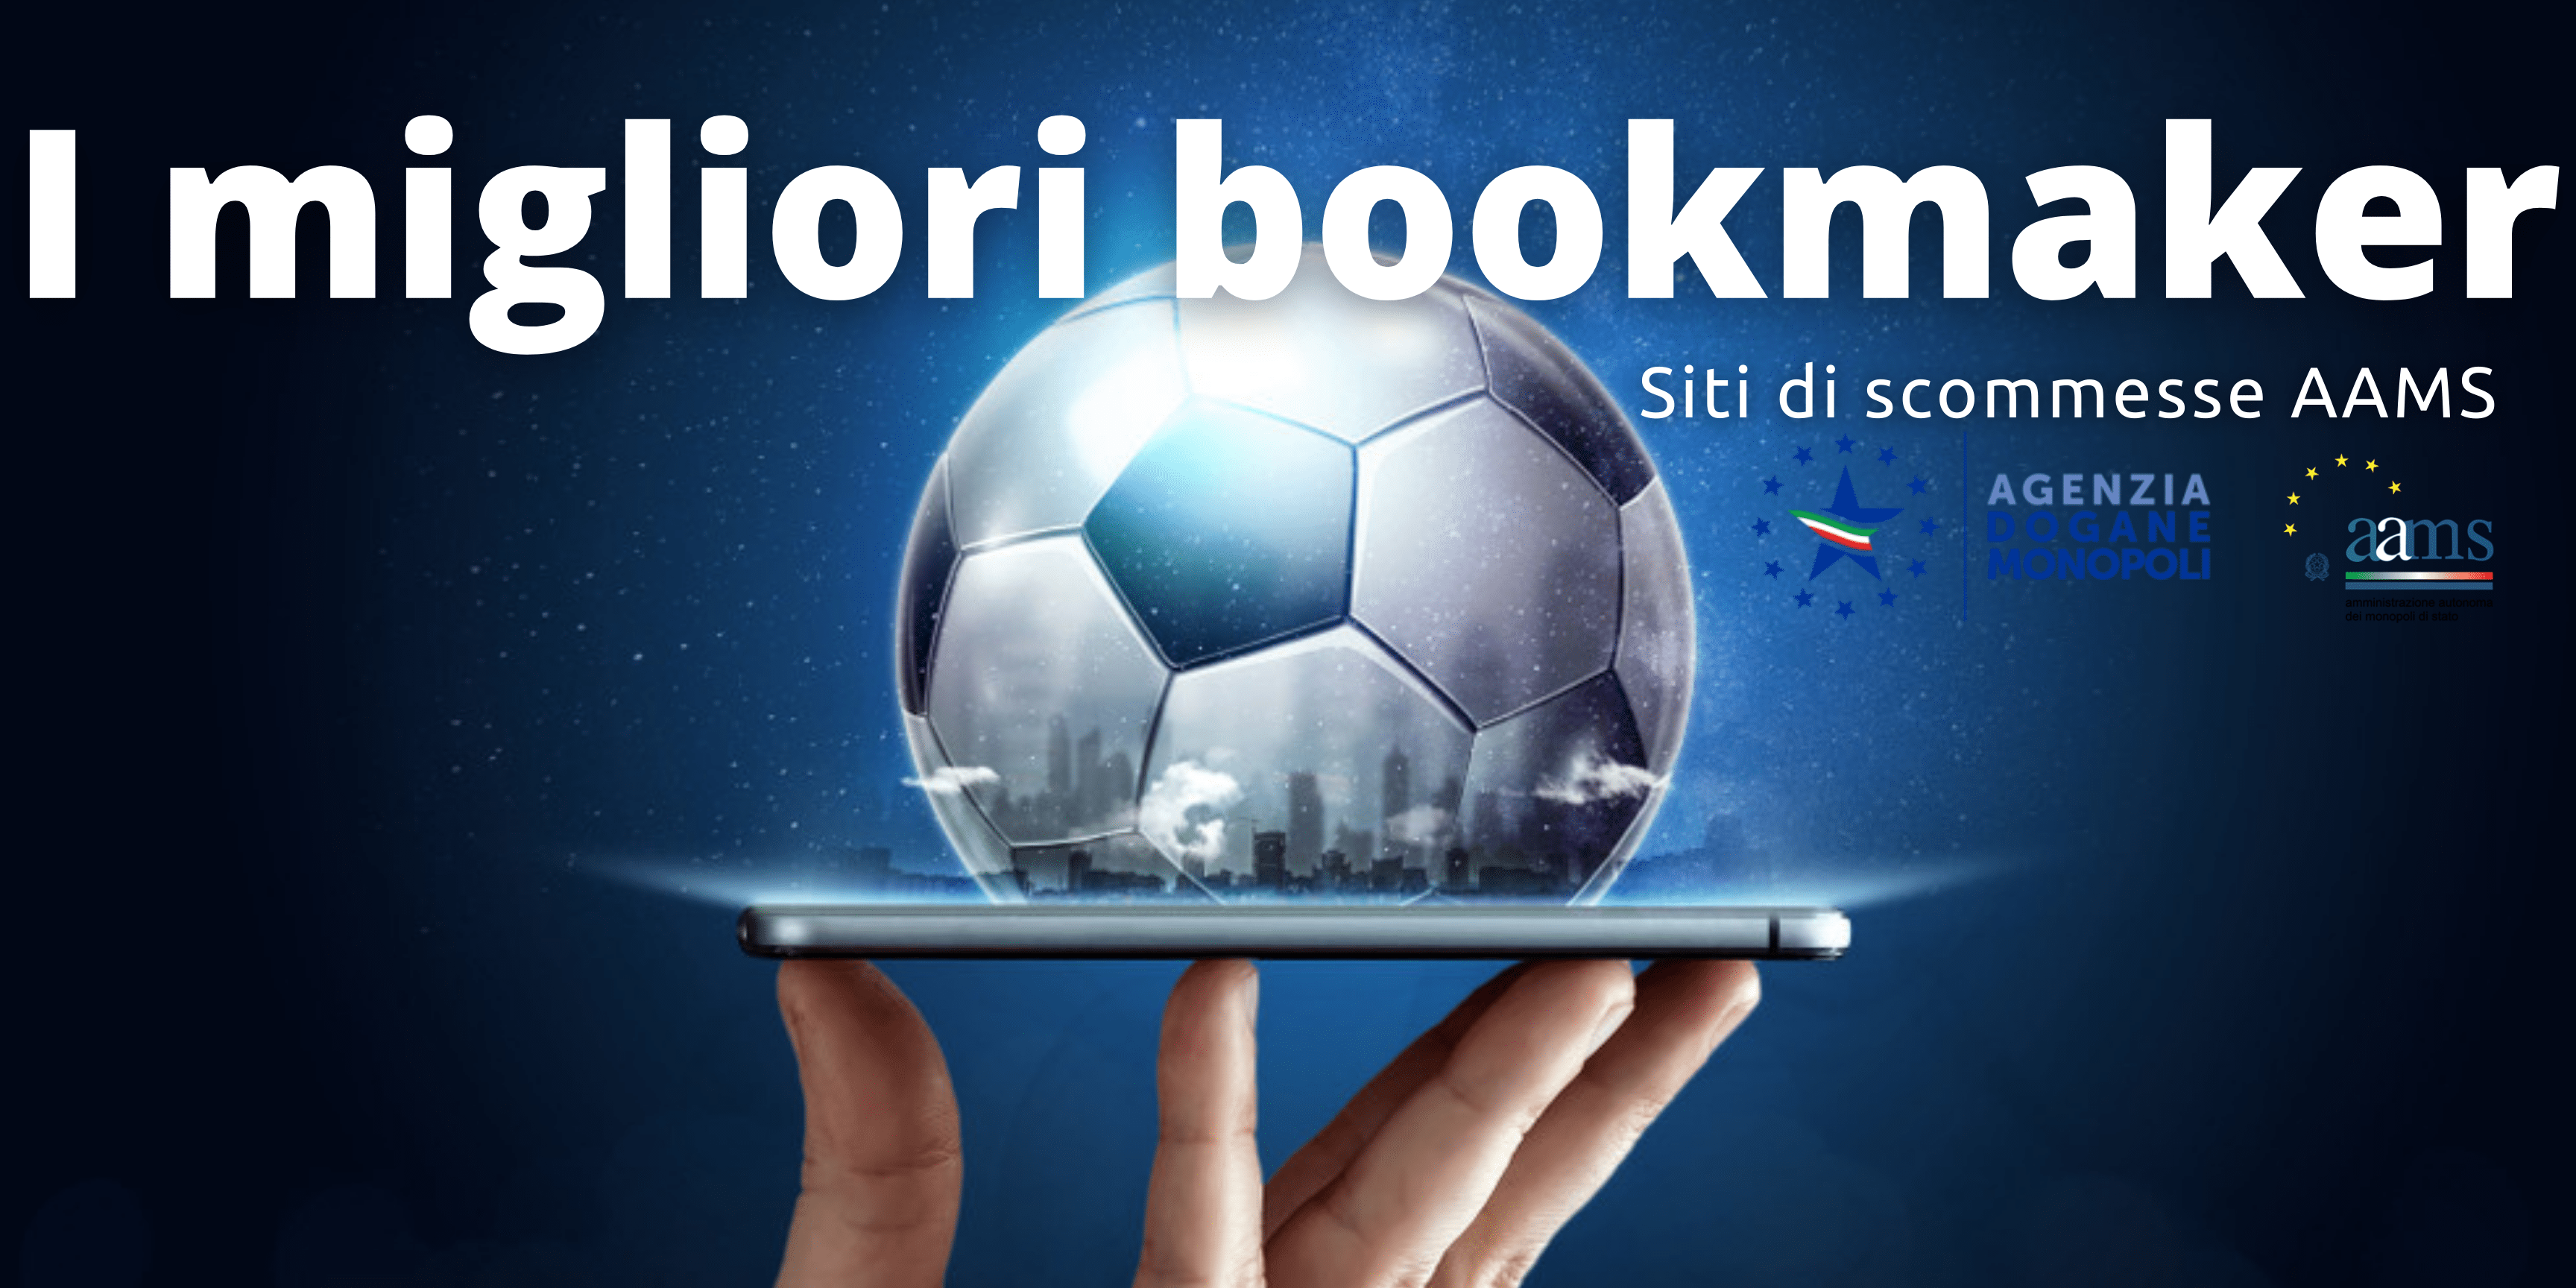 I migliori bookmaker AAMS ADM